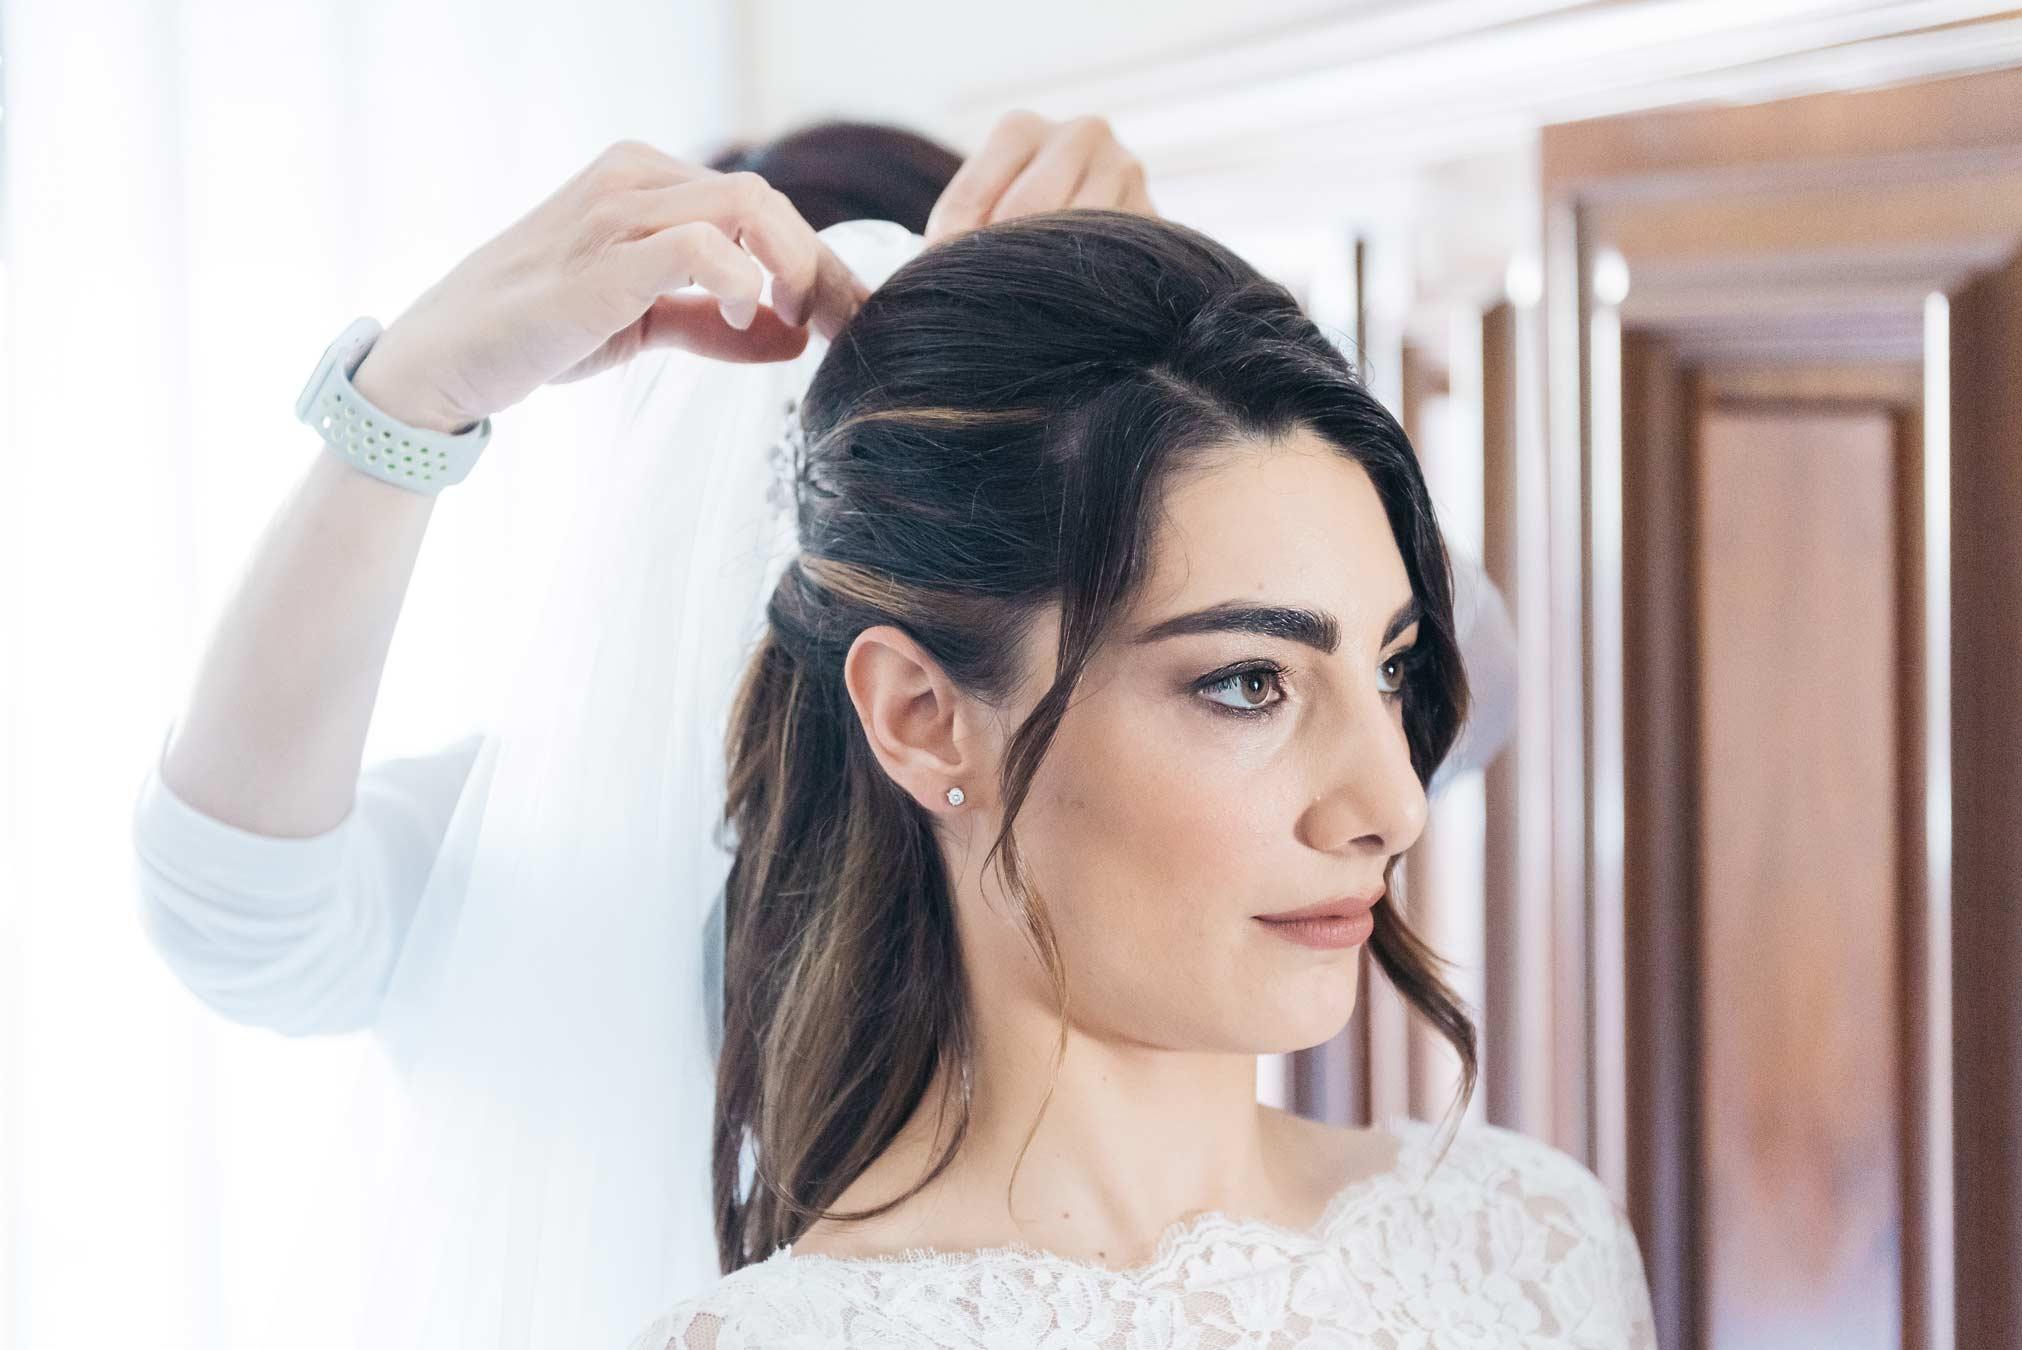 Fotografo-Matrimonio-Stile-Reportage-Roma-Preparativi-Sposa